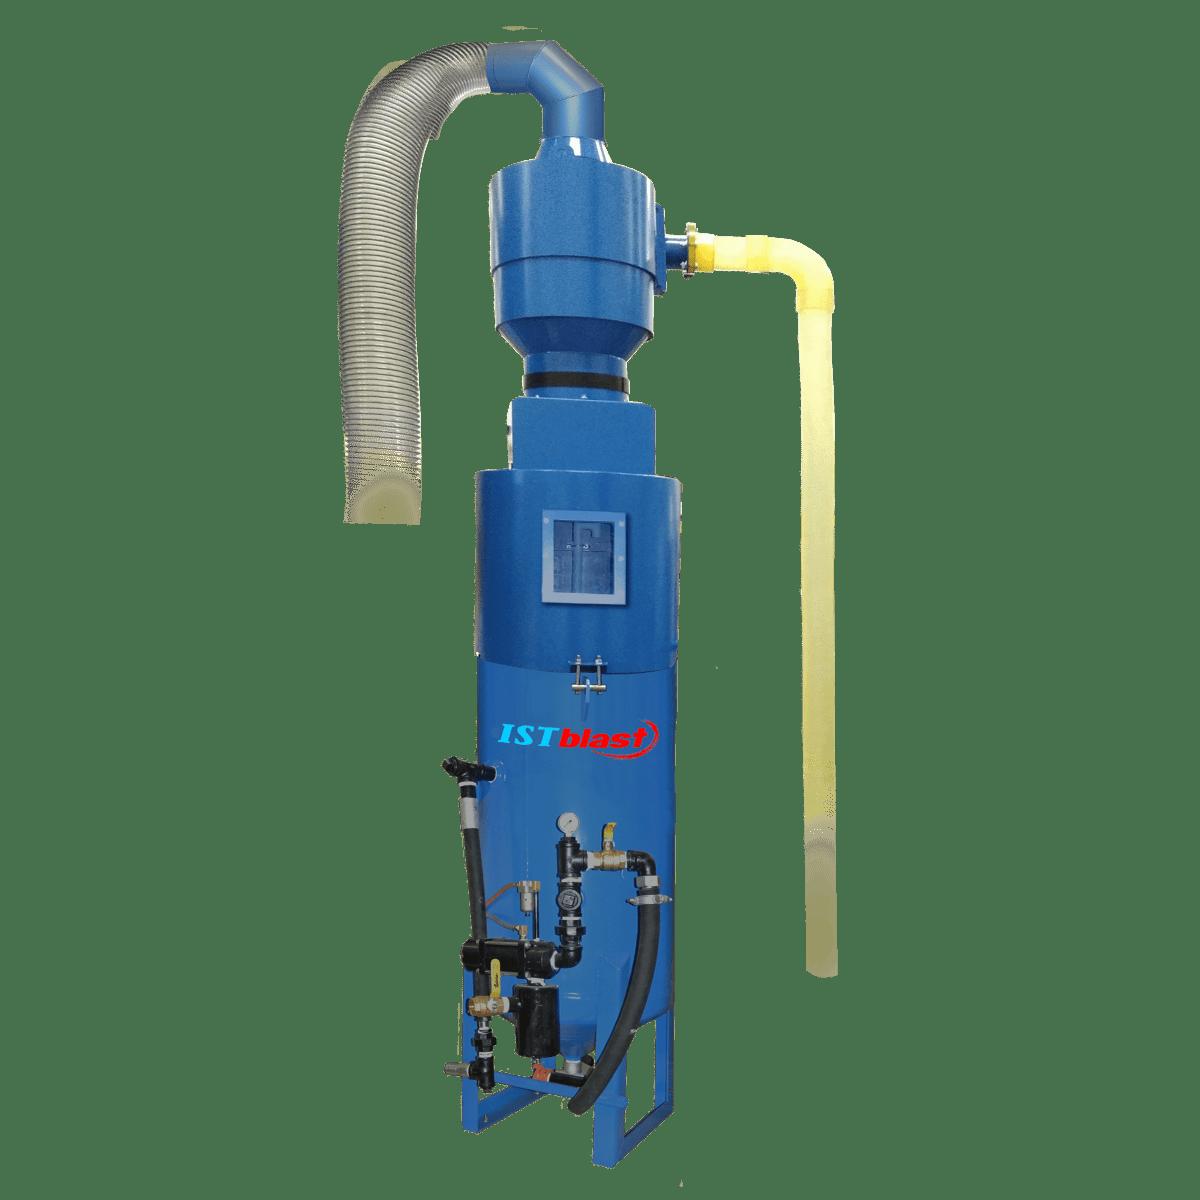 Sandblast Pot with Storage Hopper & Cyclonic Separator Assembly - ISTblast